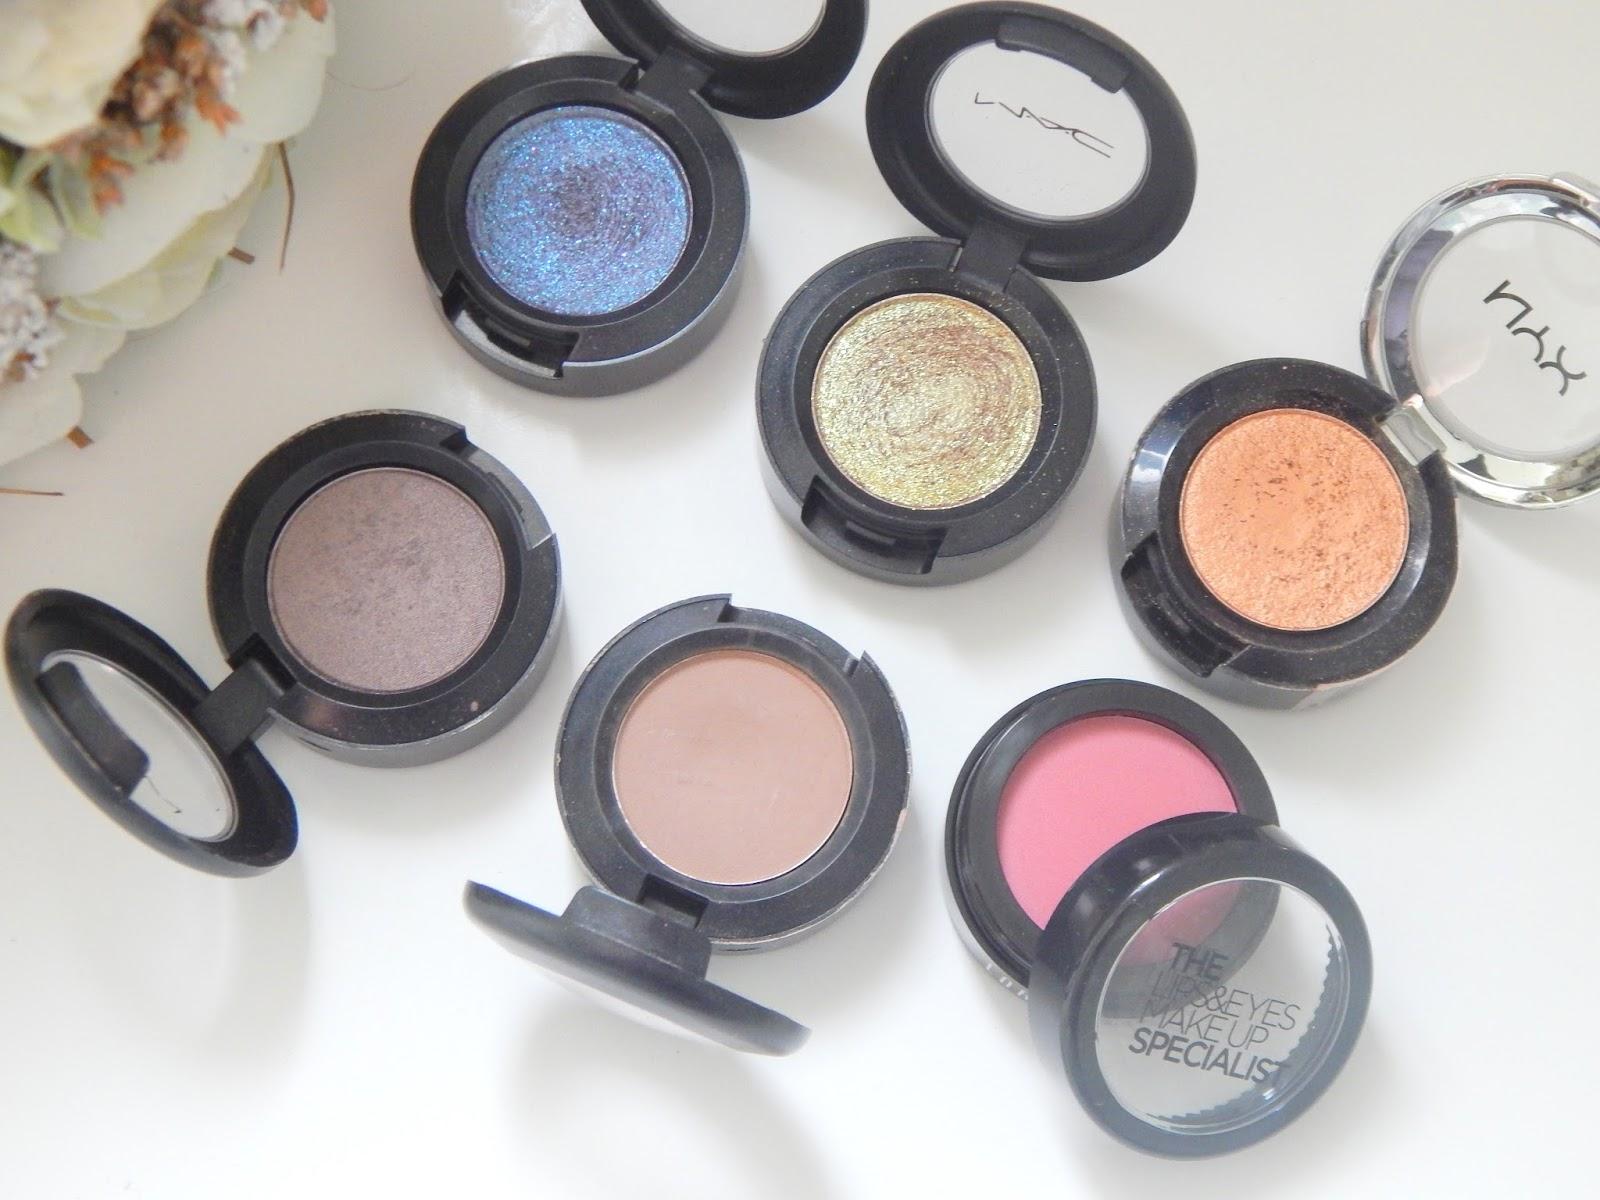 Inside The Makeup Drawers || Single Eyeshadows